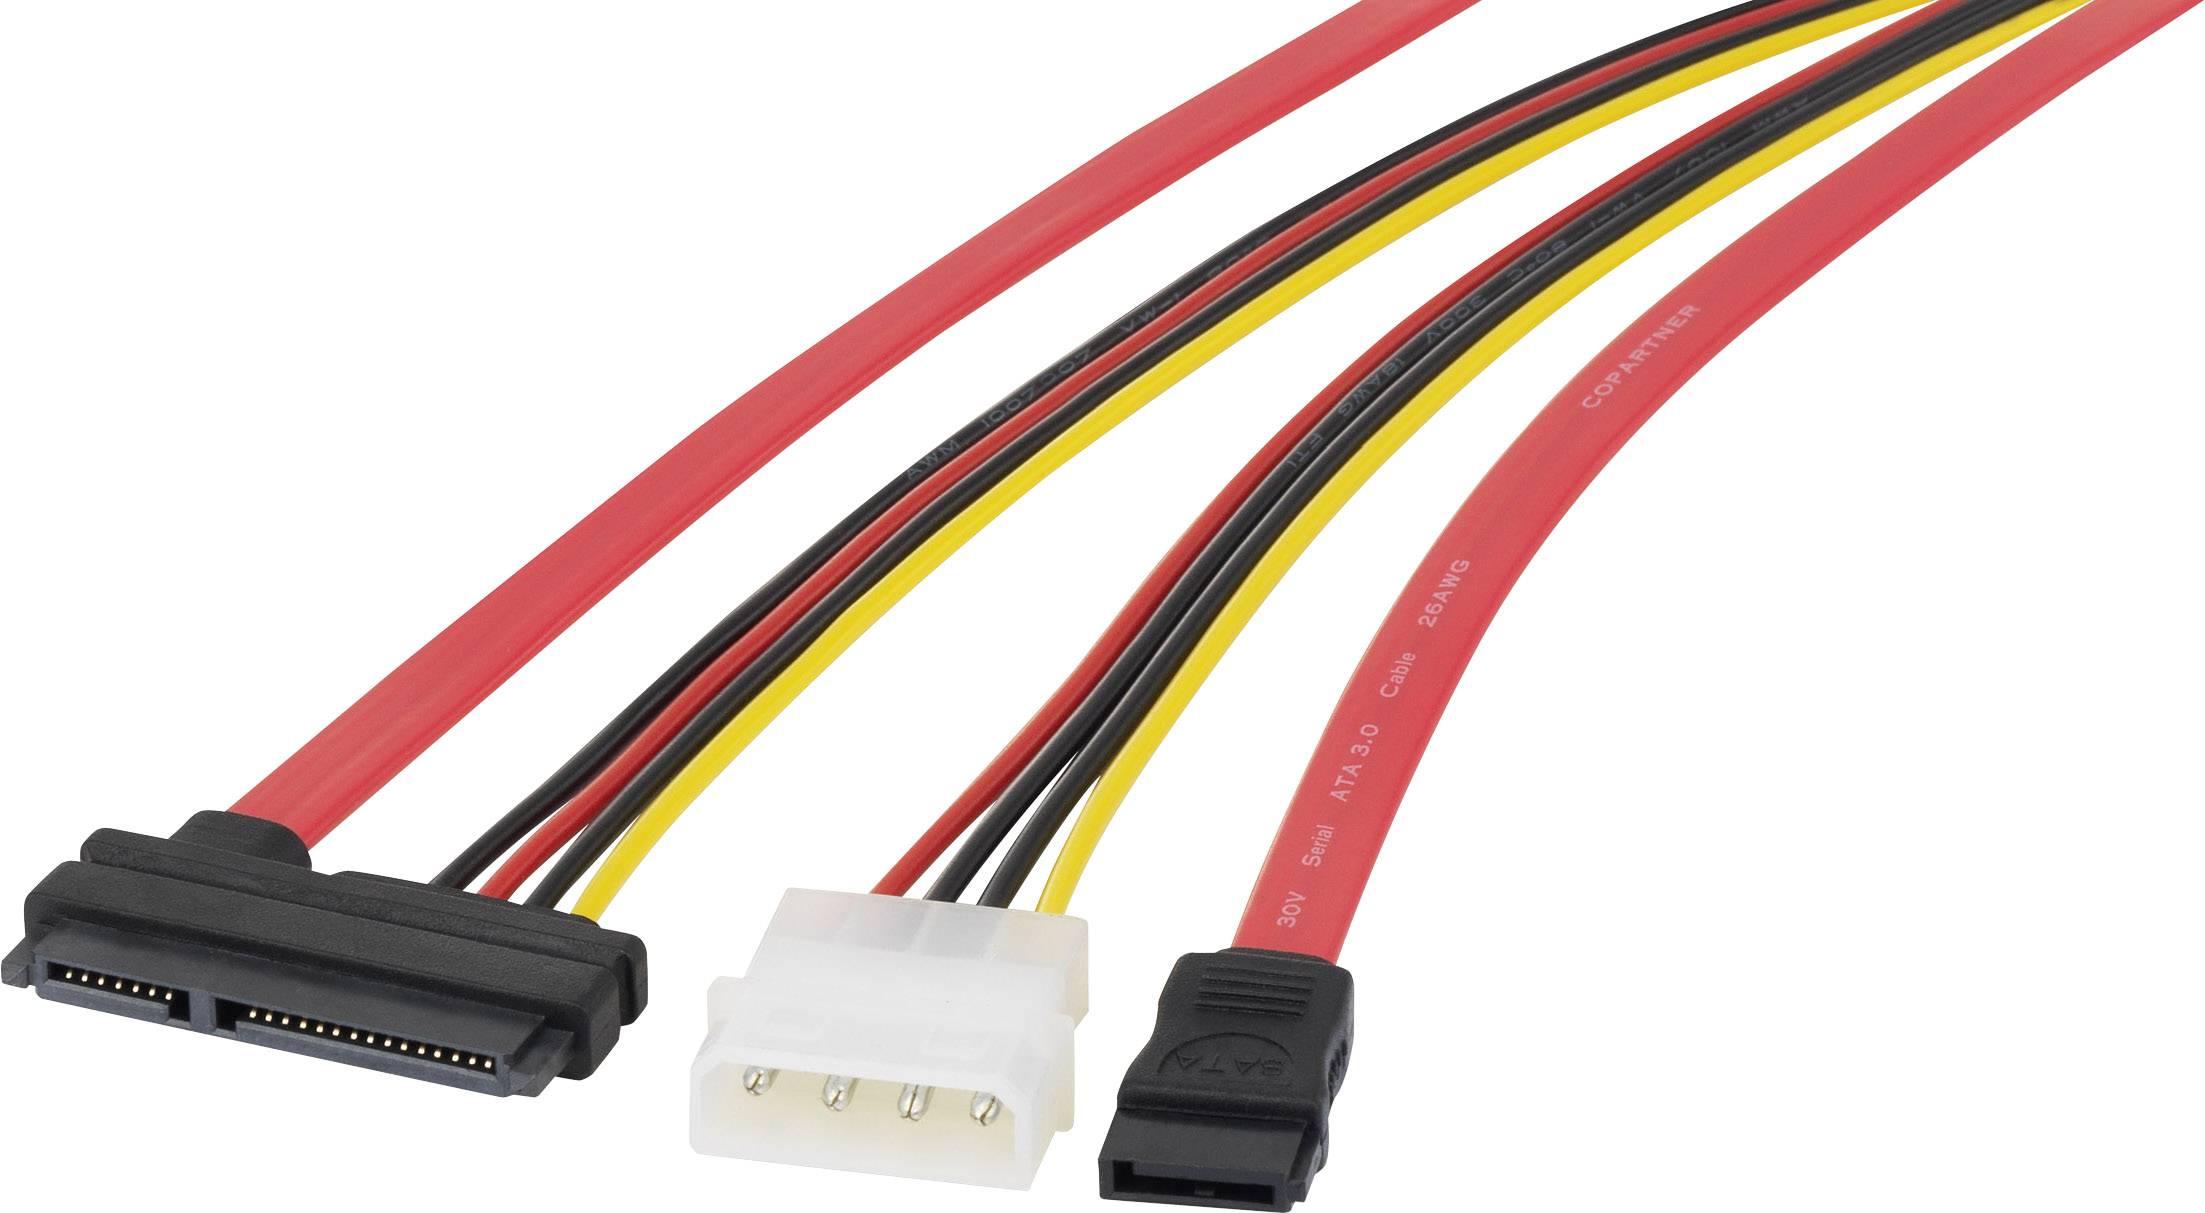 SATA II, IDE prepojovací kábel Renkforce RF-4212171, čierna, červená, žltá